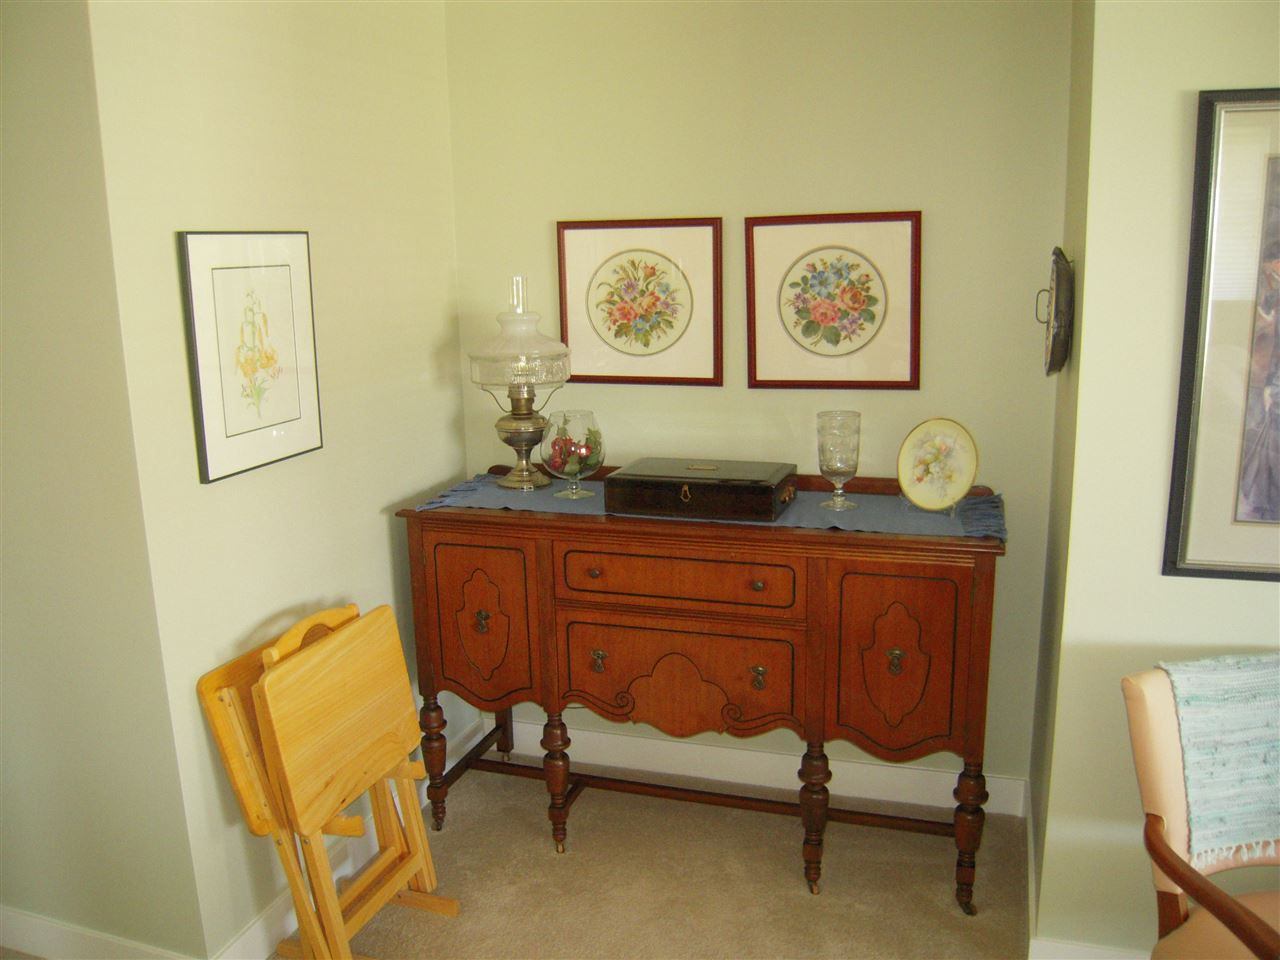 Photo 13: Photos: 5735 EMILY Way in Sechelt: Sechelt District House for sale (Sunshine Coast)  : MLS®# R2179124